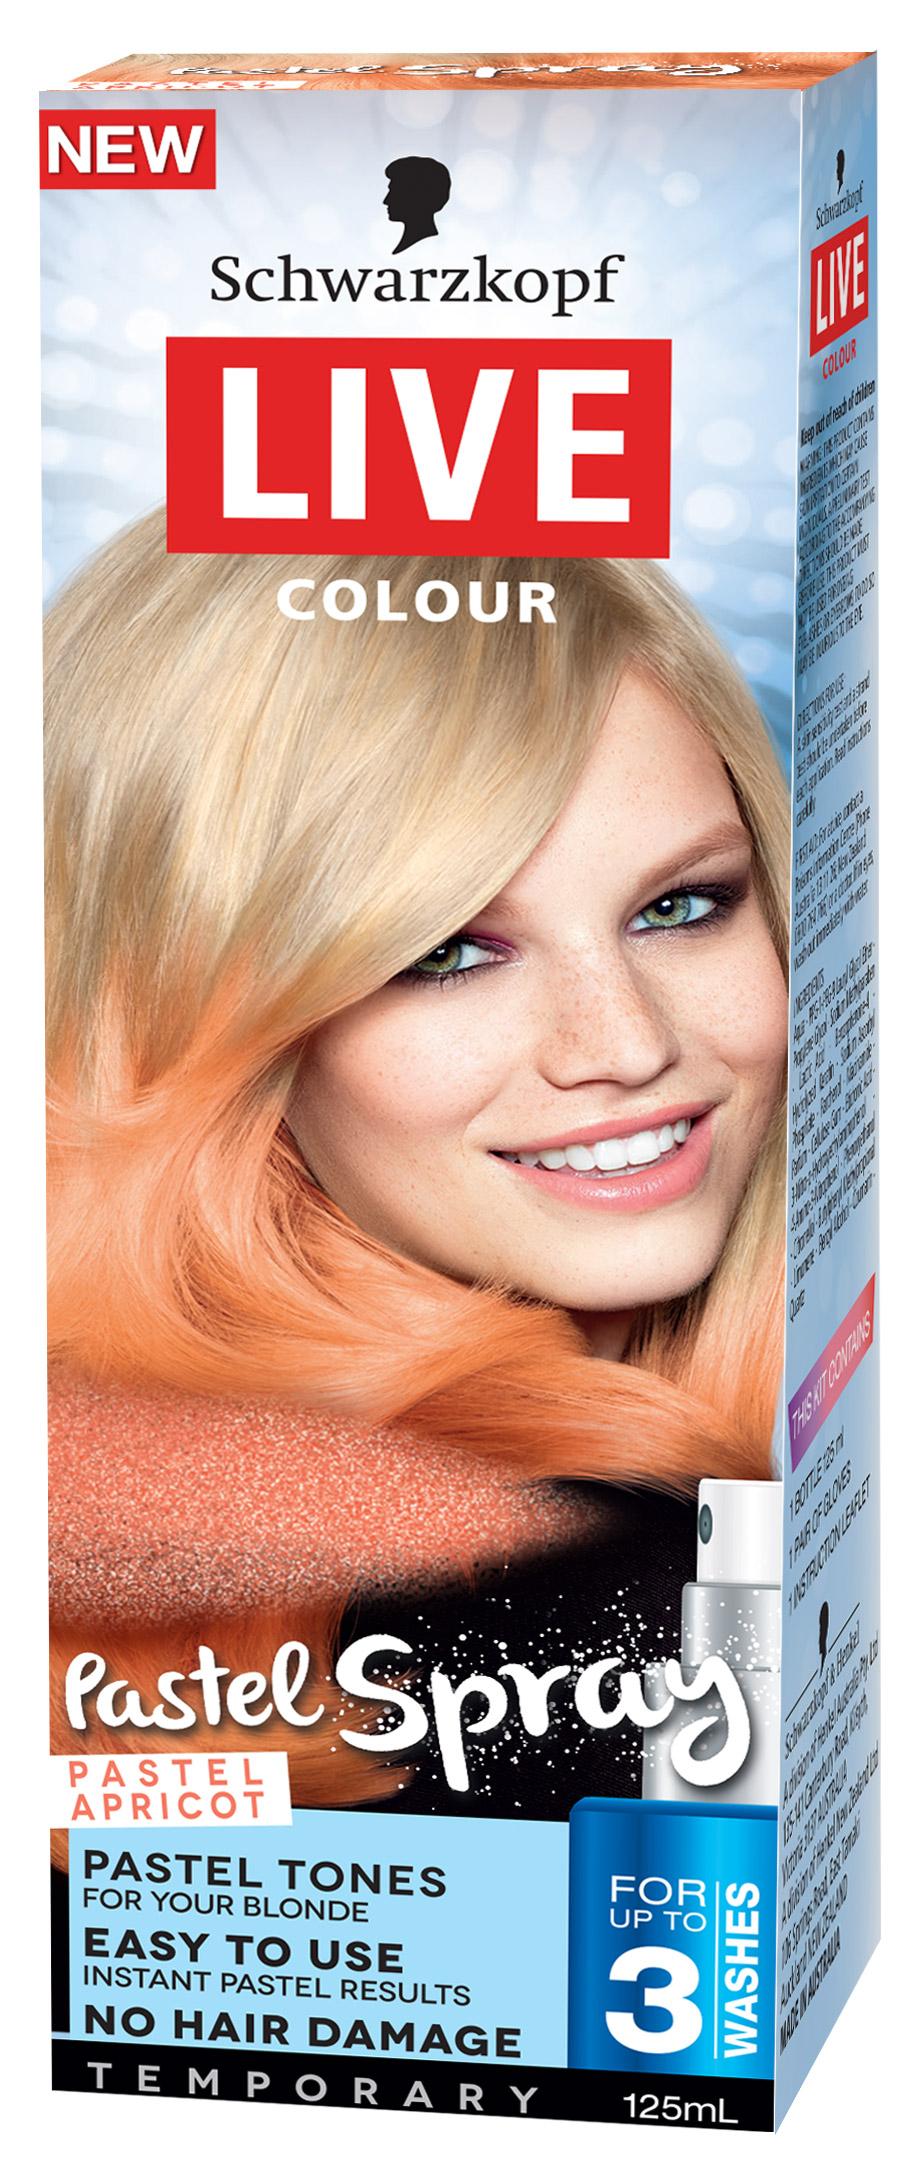 LIVE Pastel Spray Pastel Apricot 3D RF-0040820